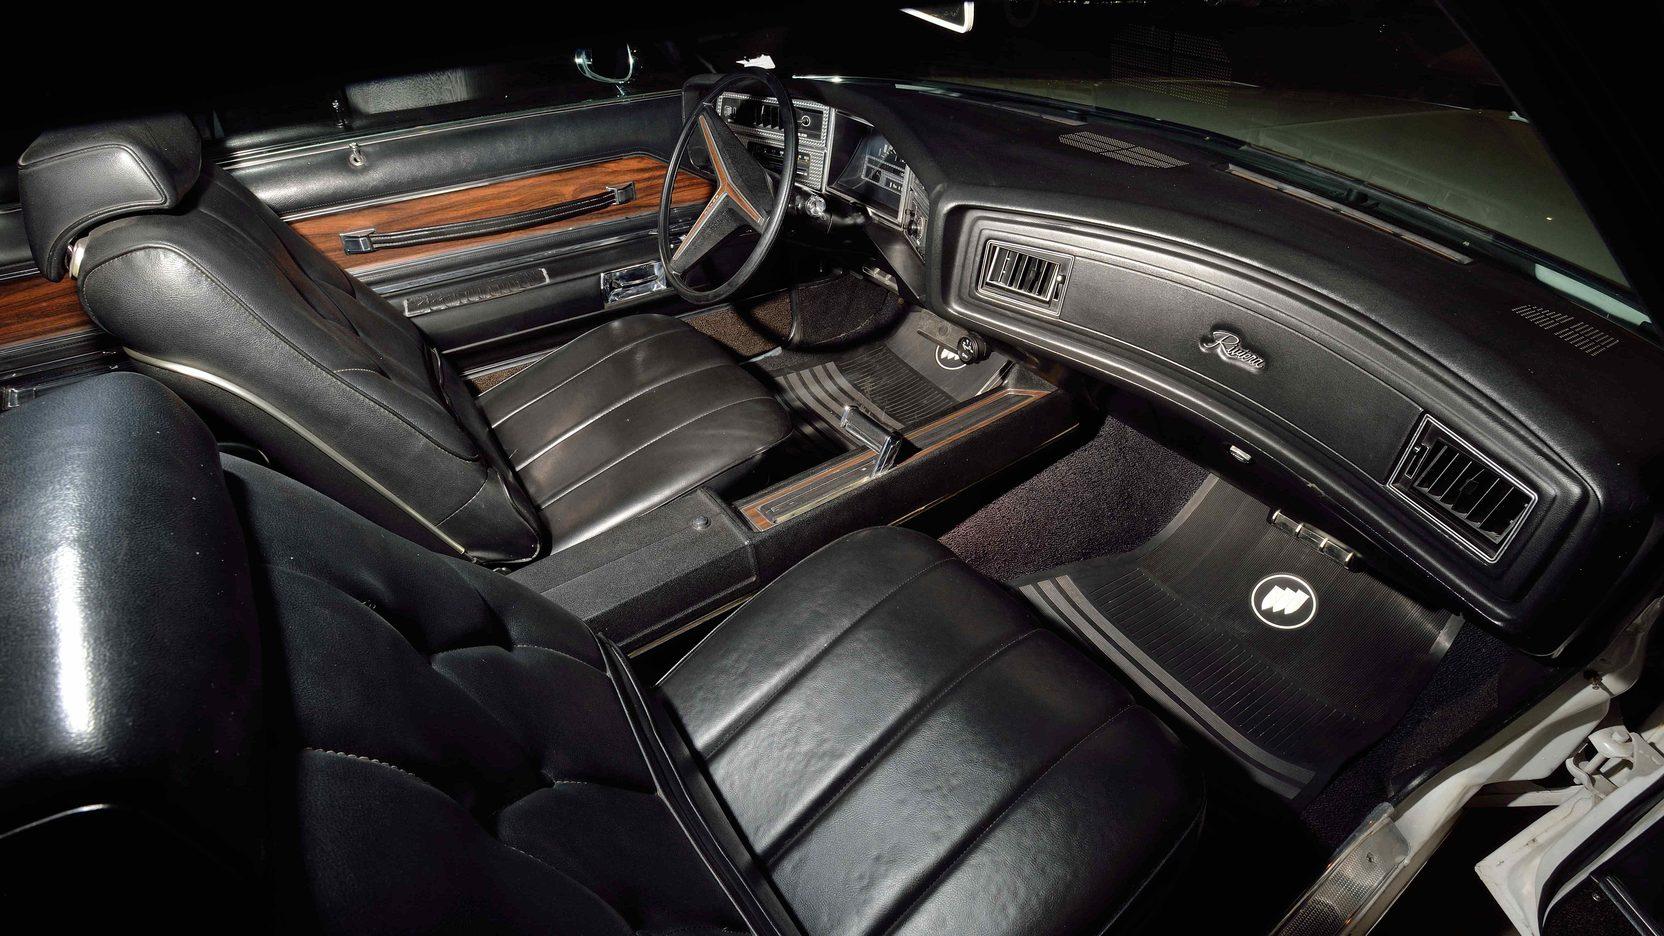 1971 Buick Riviera interior Passenger